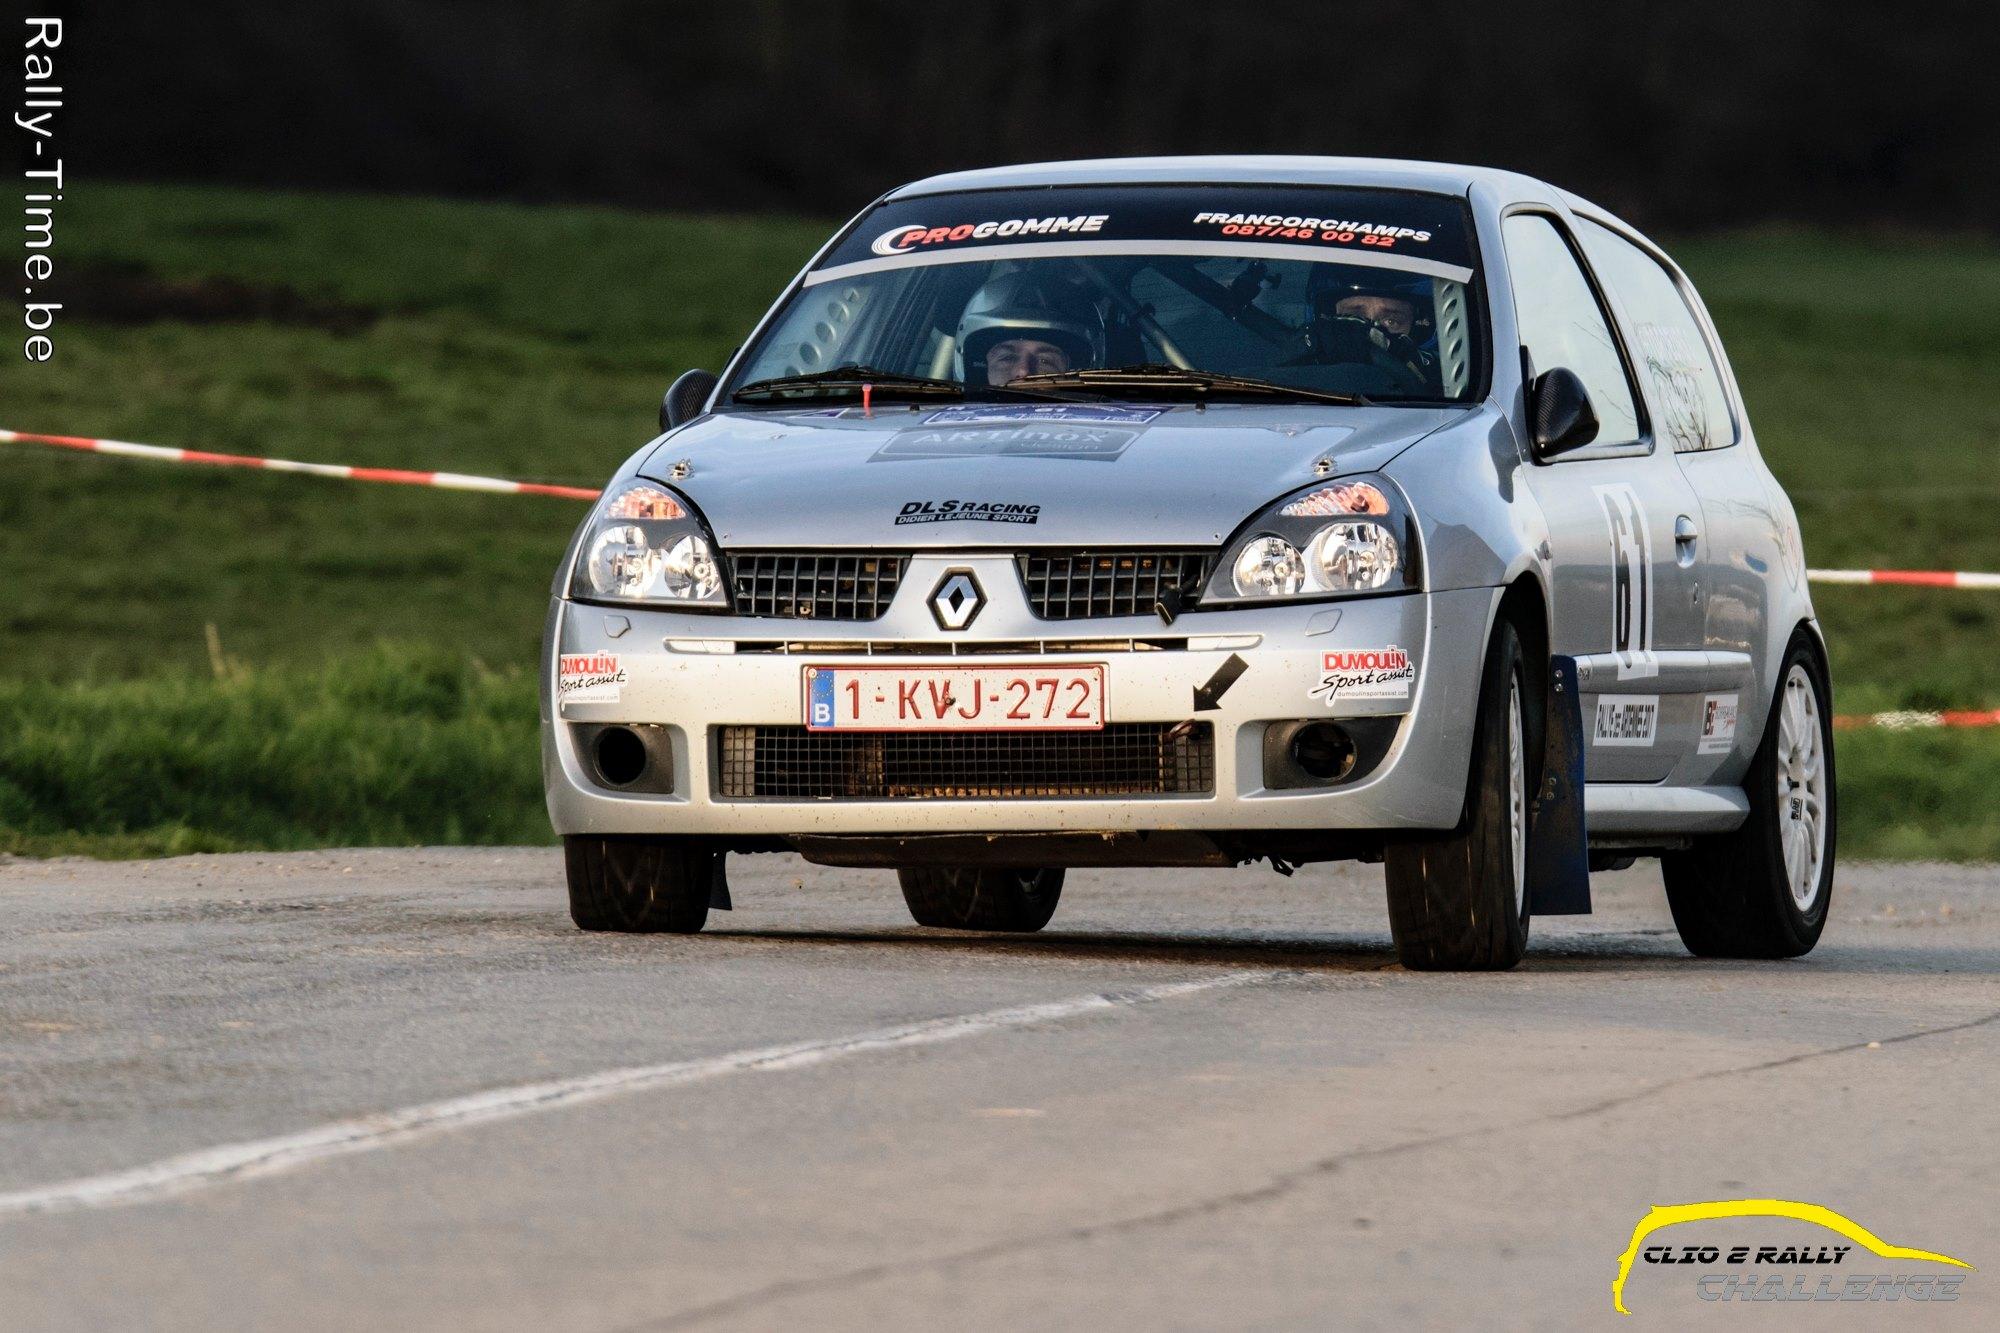 Monteberg Shortrally 2de manche Clio 2 Rally Challenge